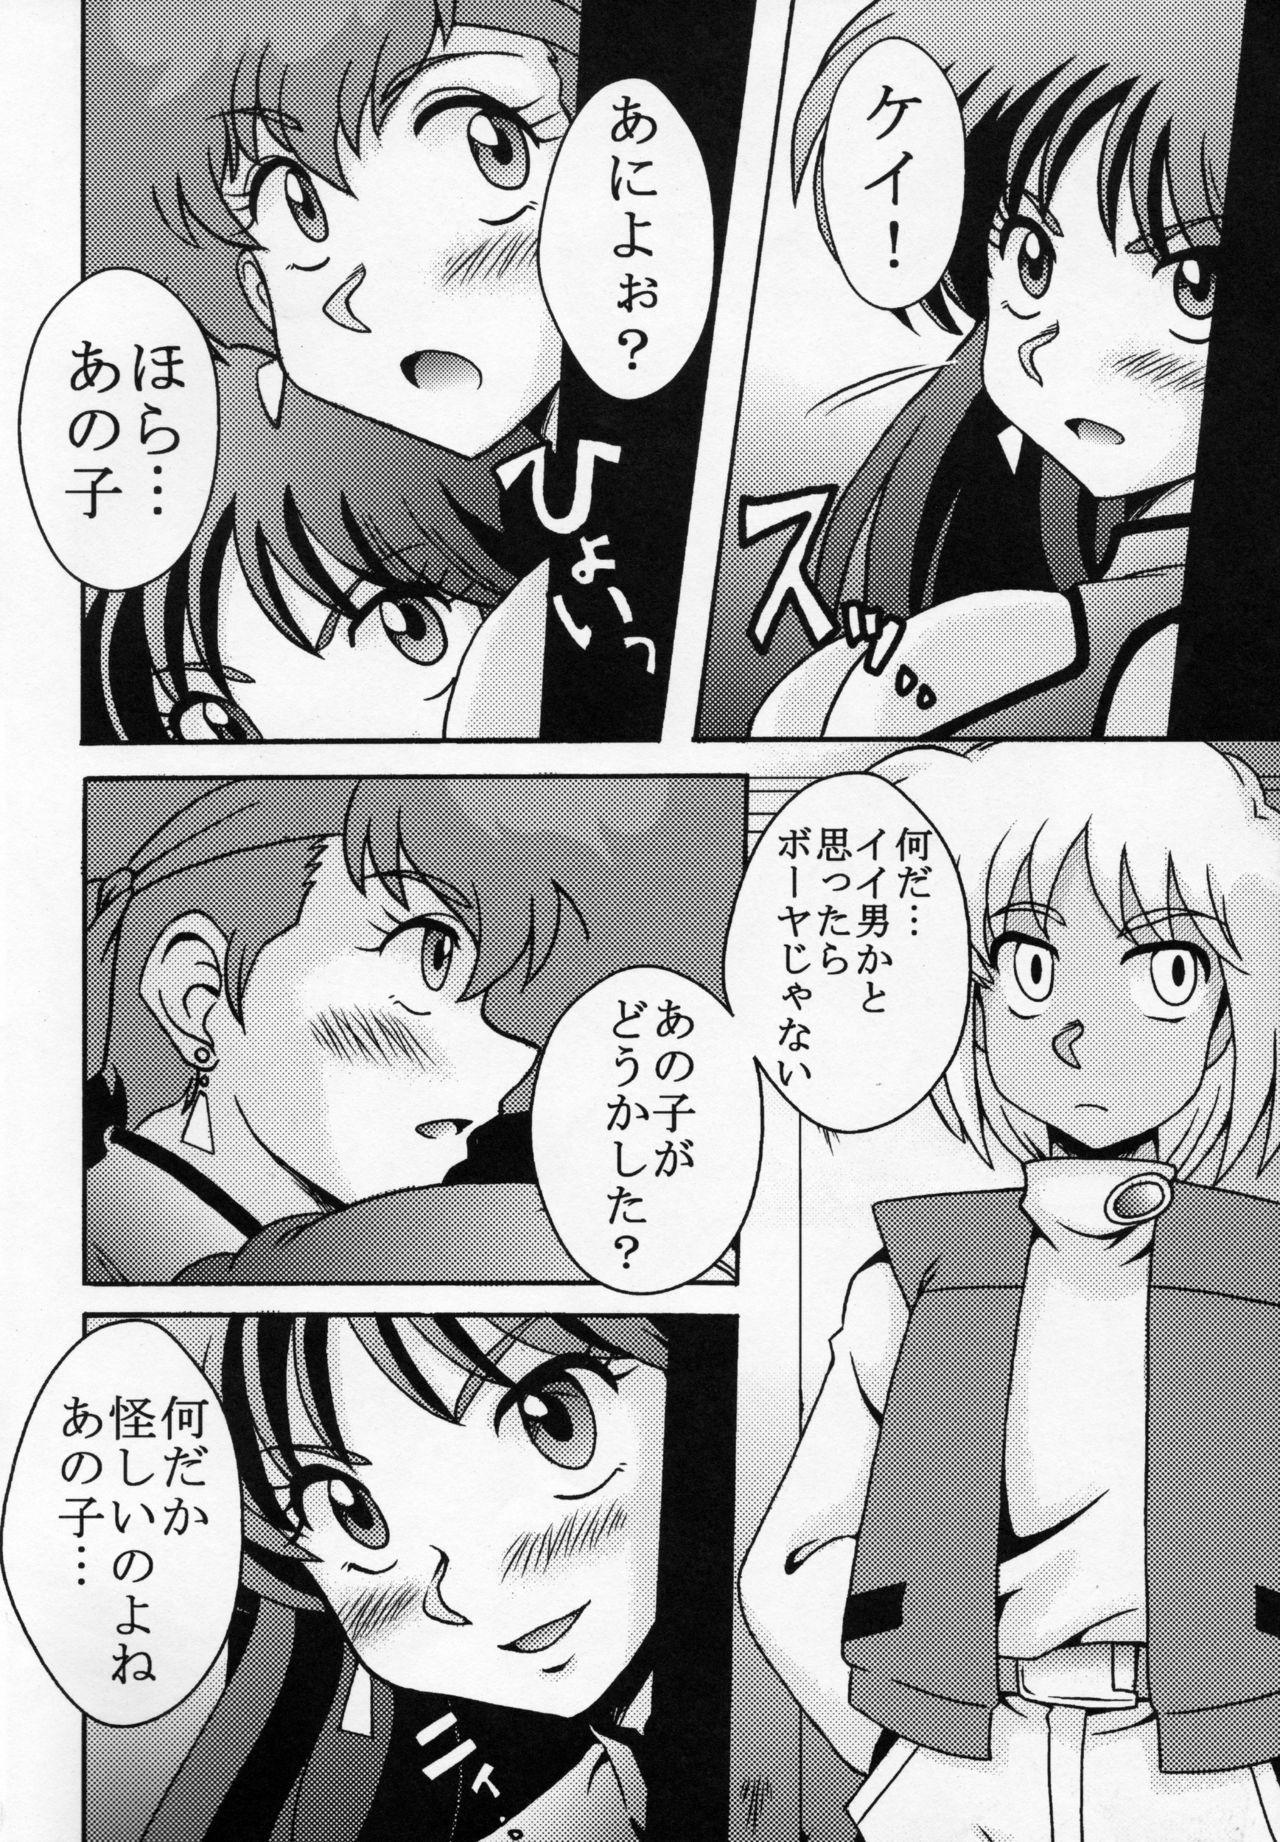 Kei to Yuri 2